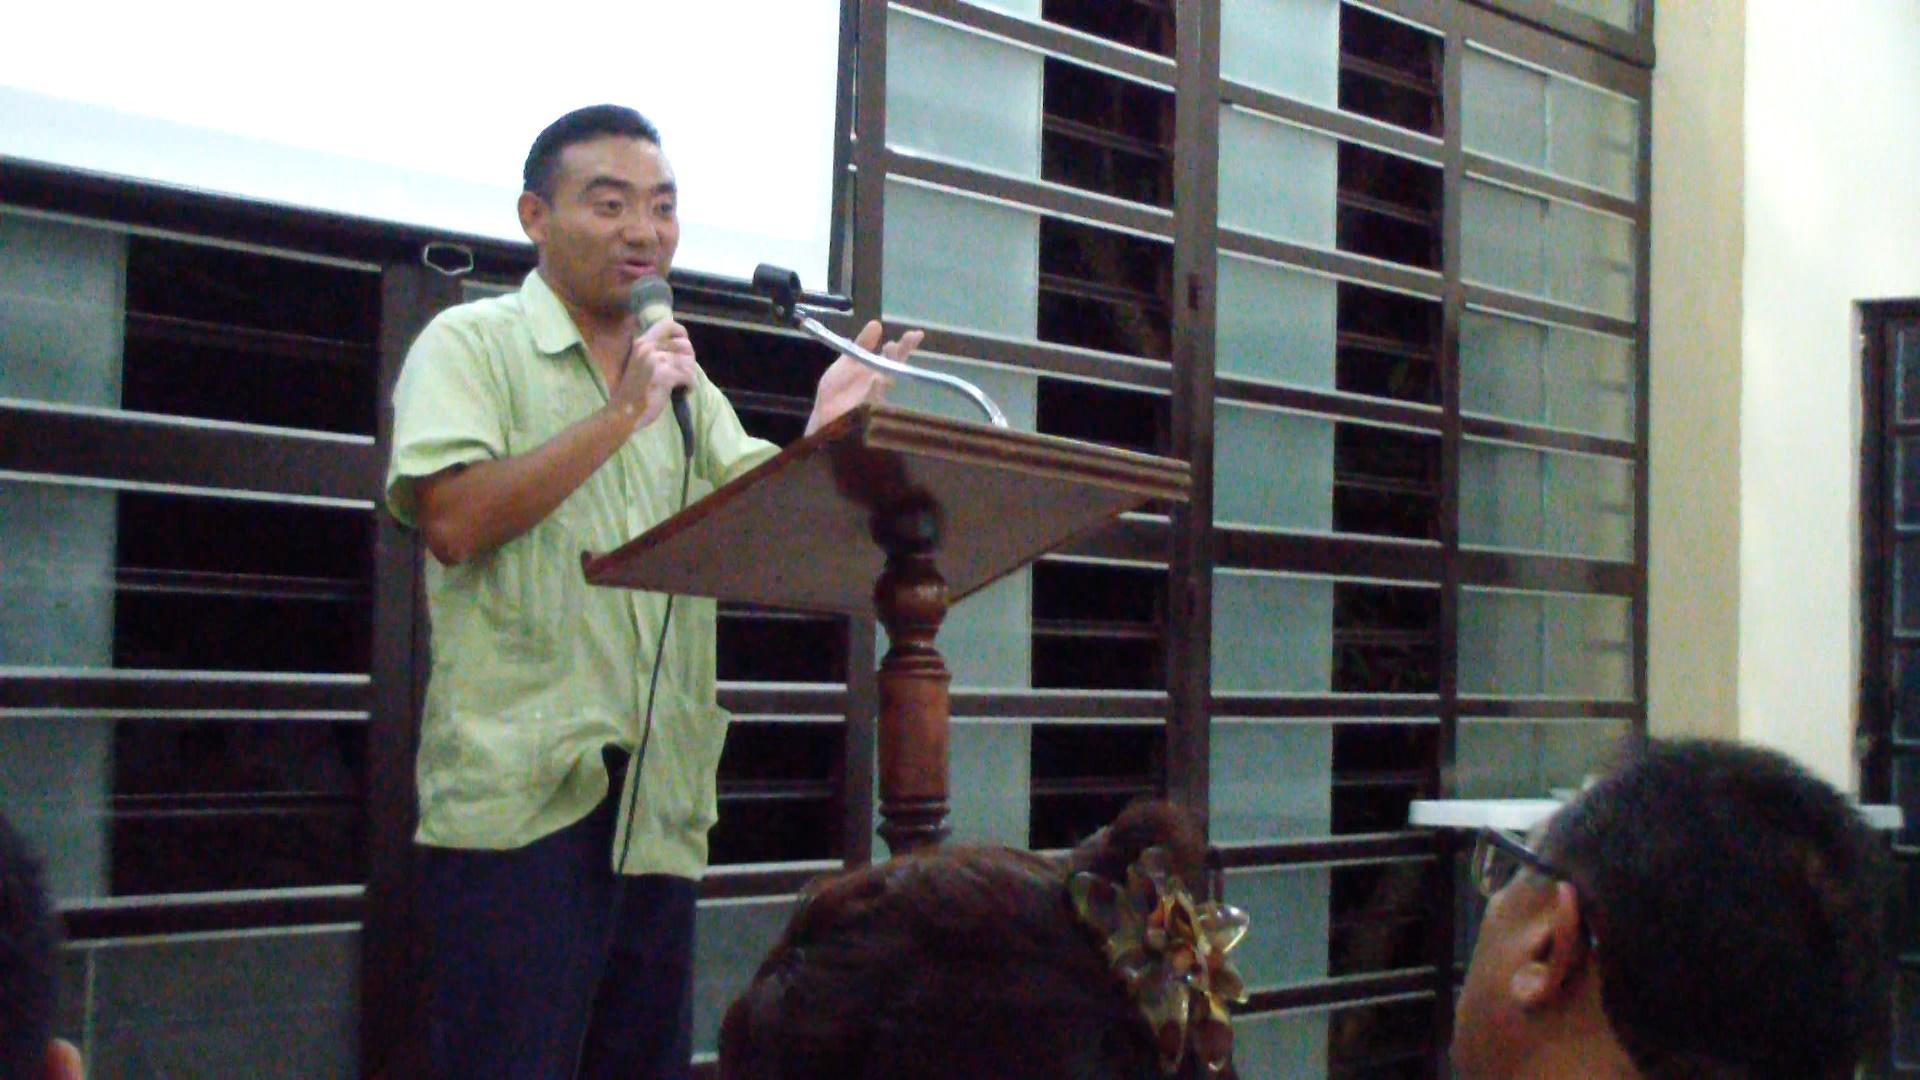 Pastor José Yam